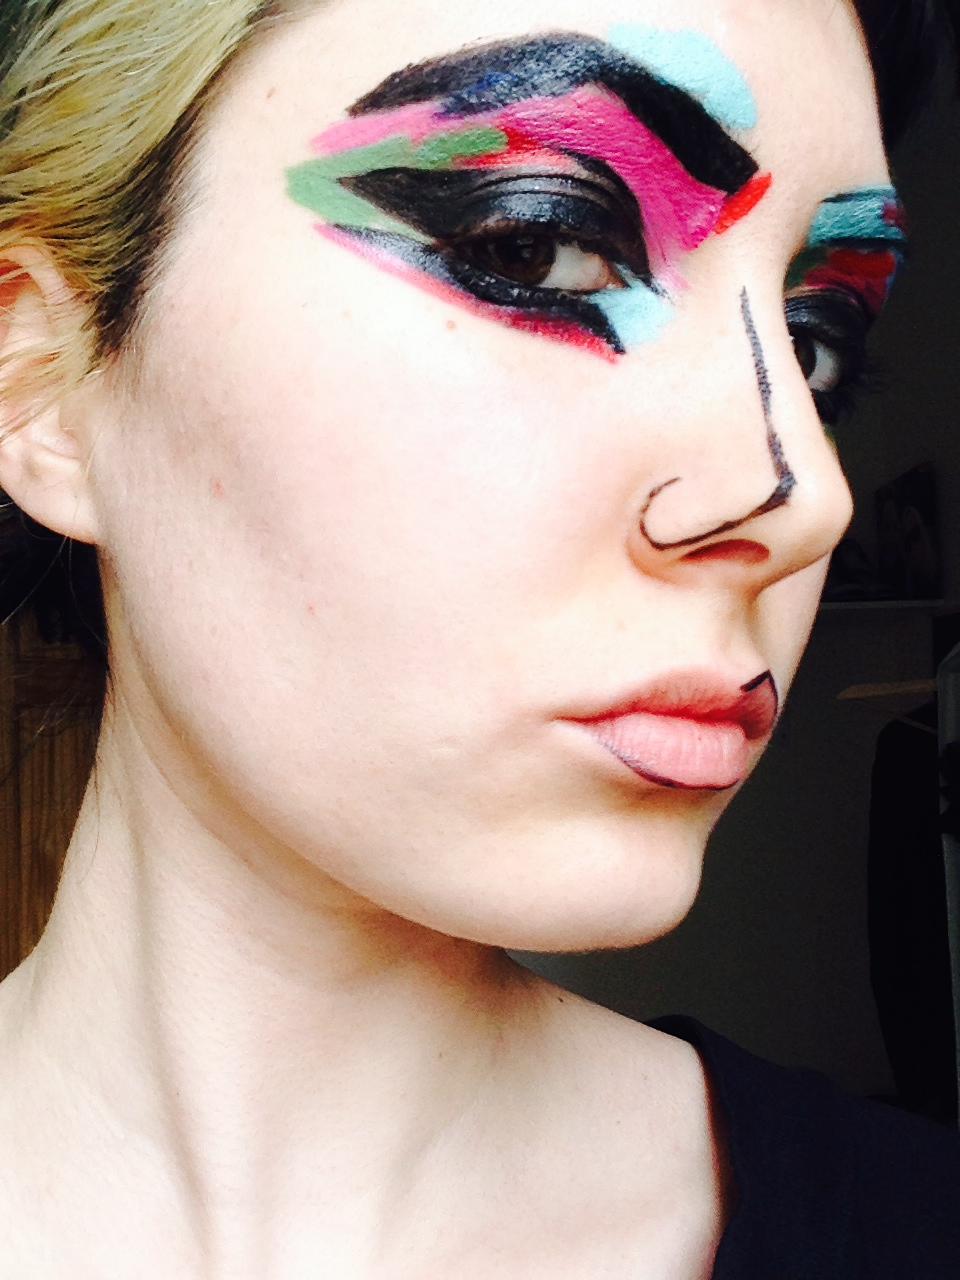 Girl Eyes Looking Up Wallpaper Abstract Art Inspired Makeup Rockstars Pinups